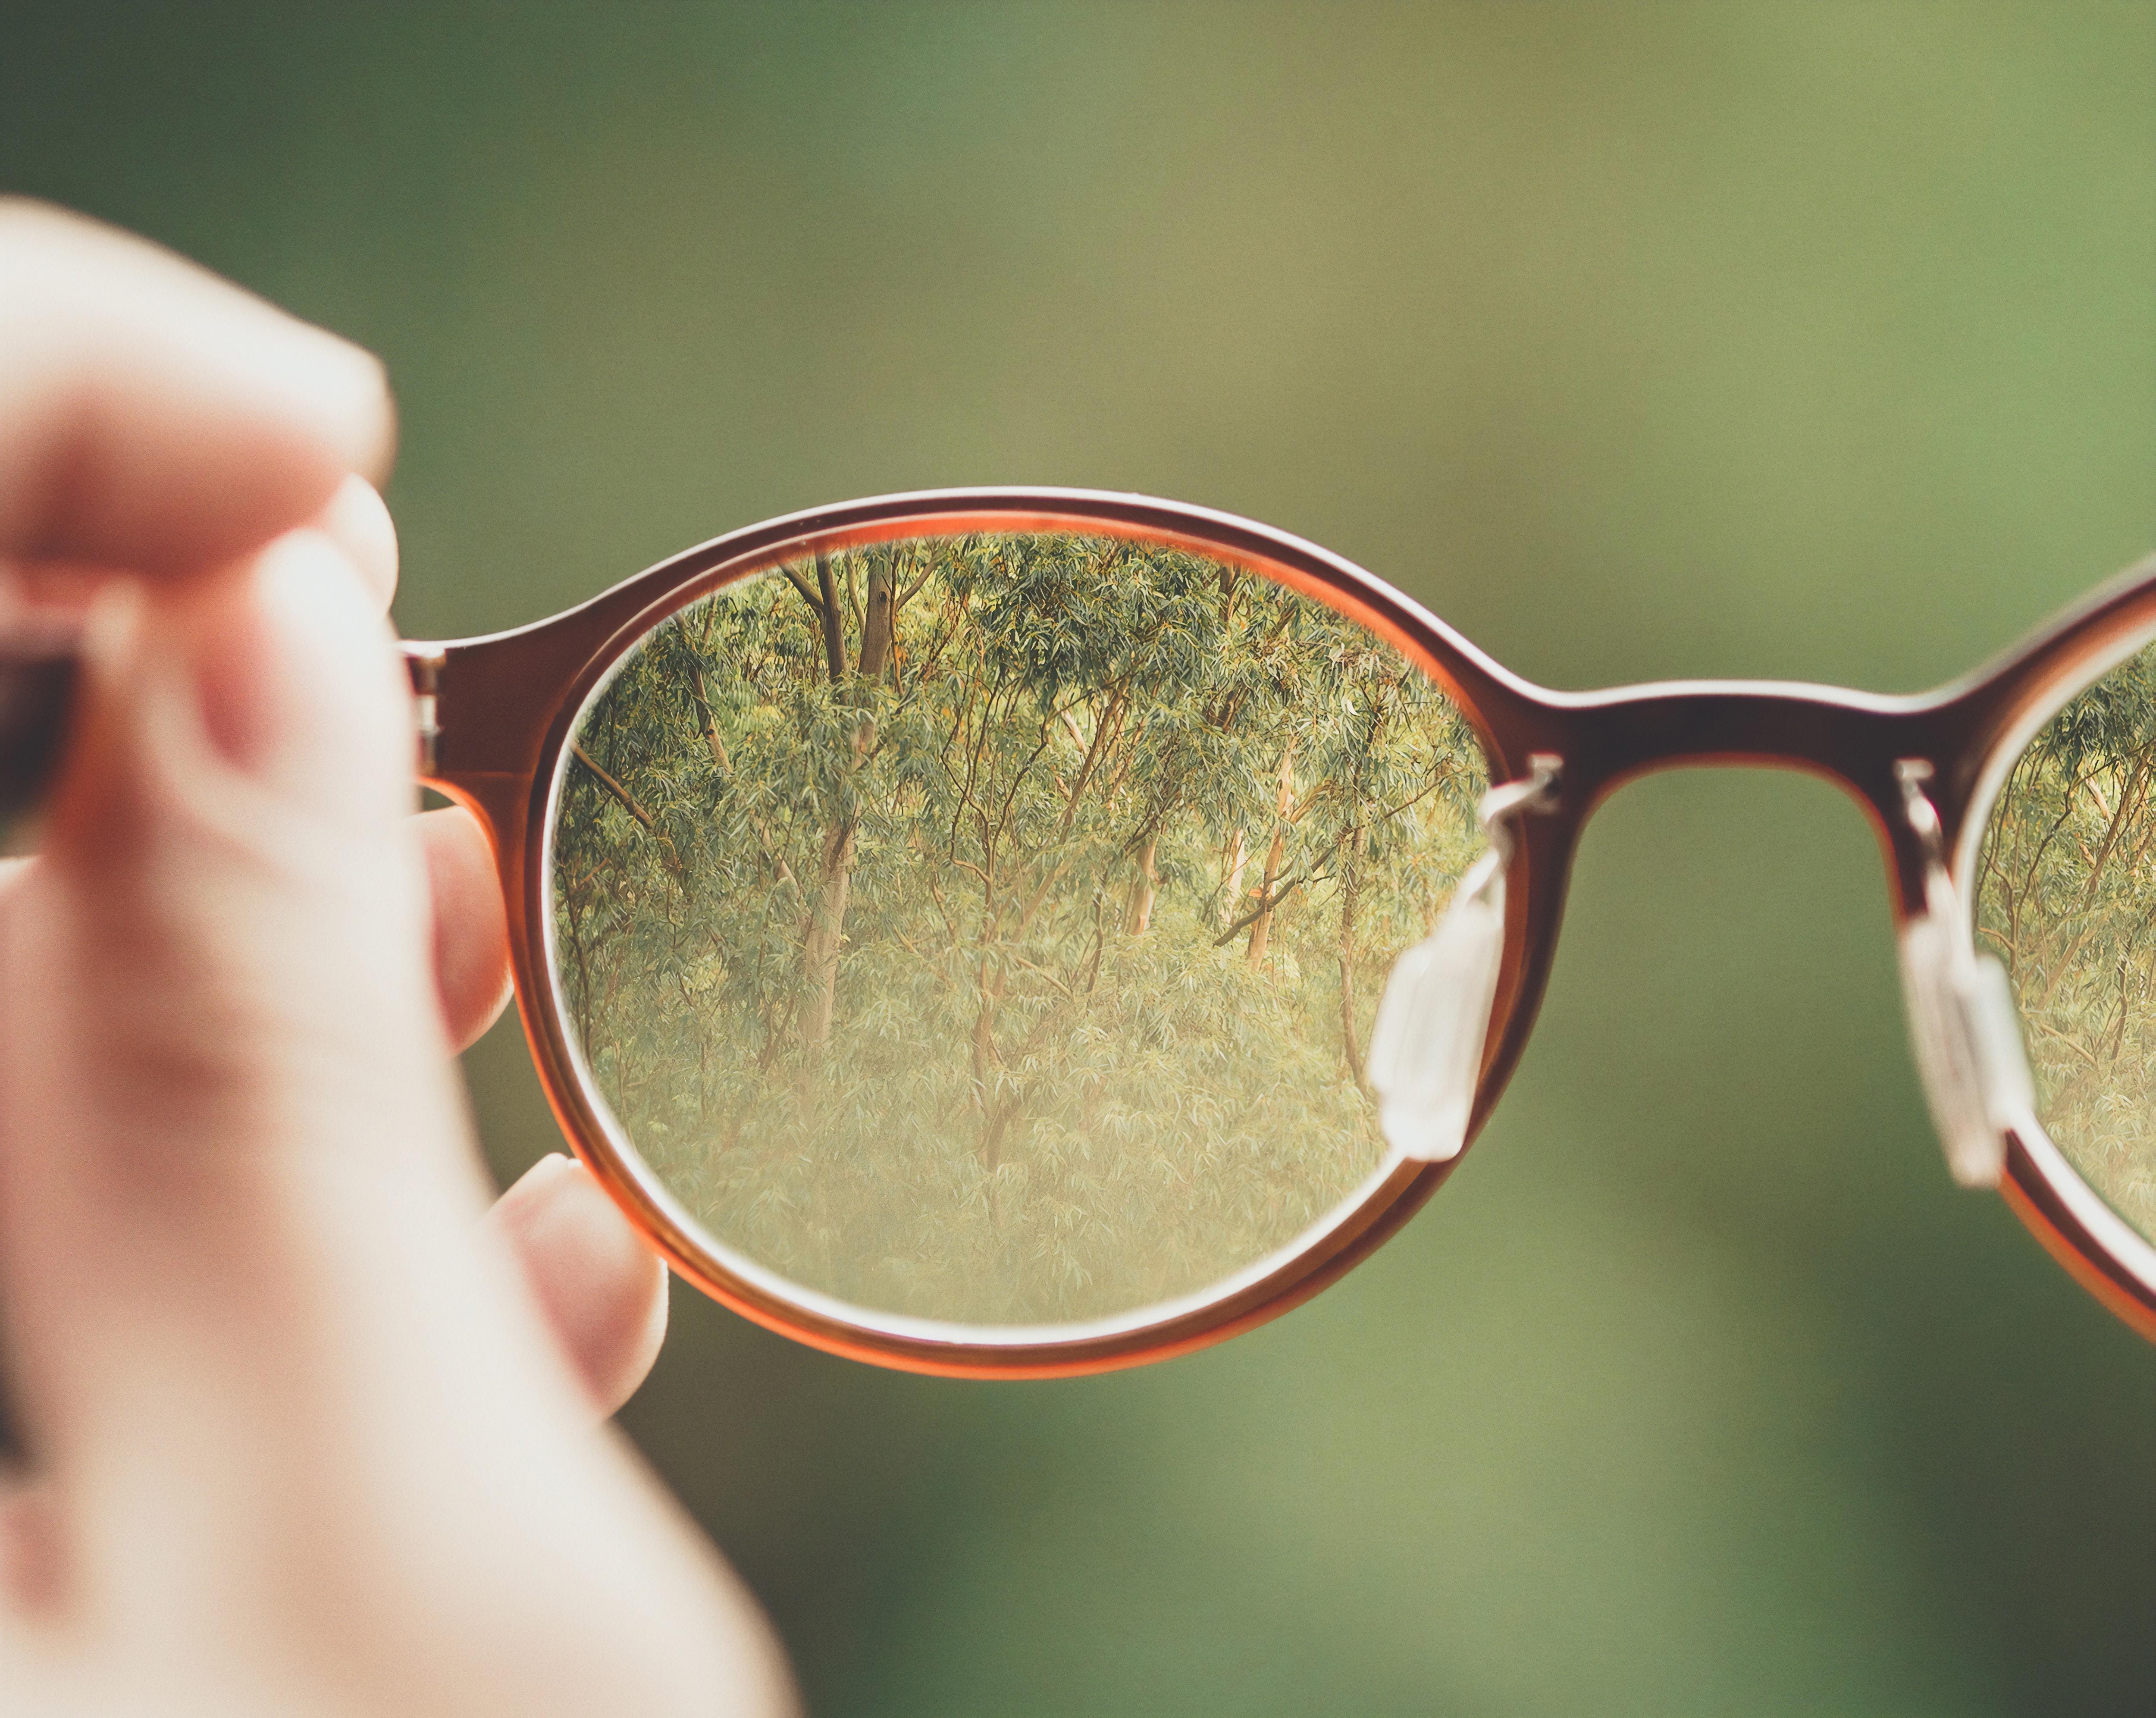 Vision and Eyewear